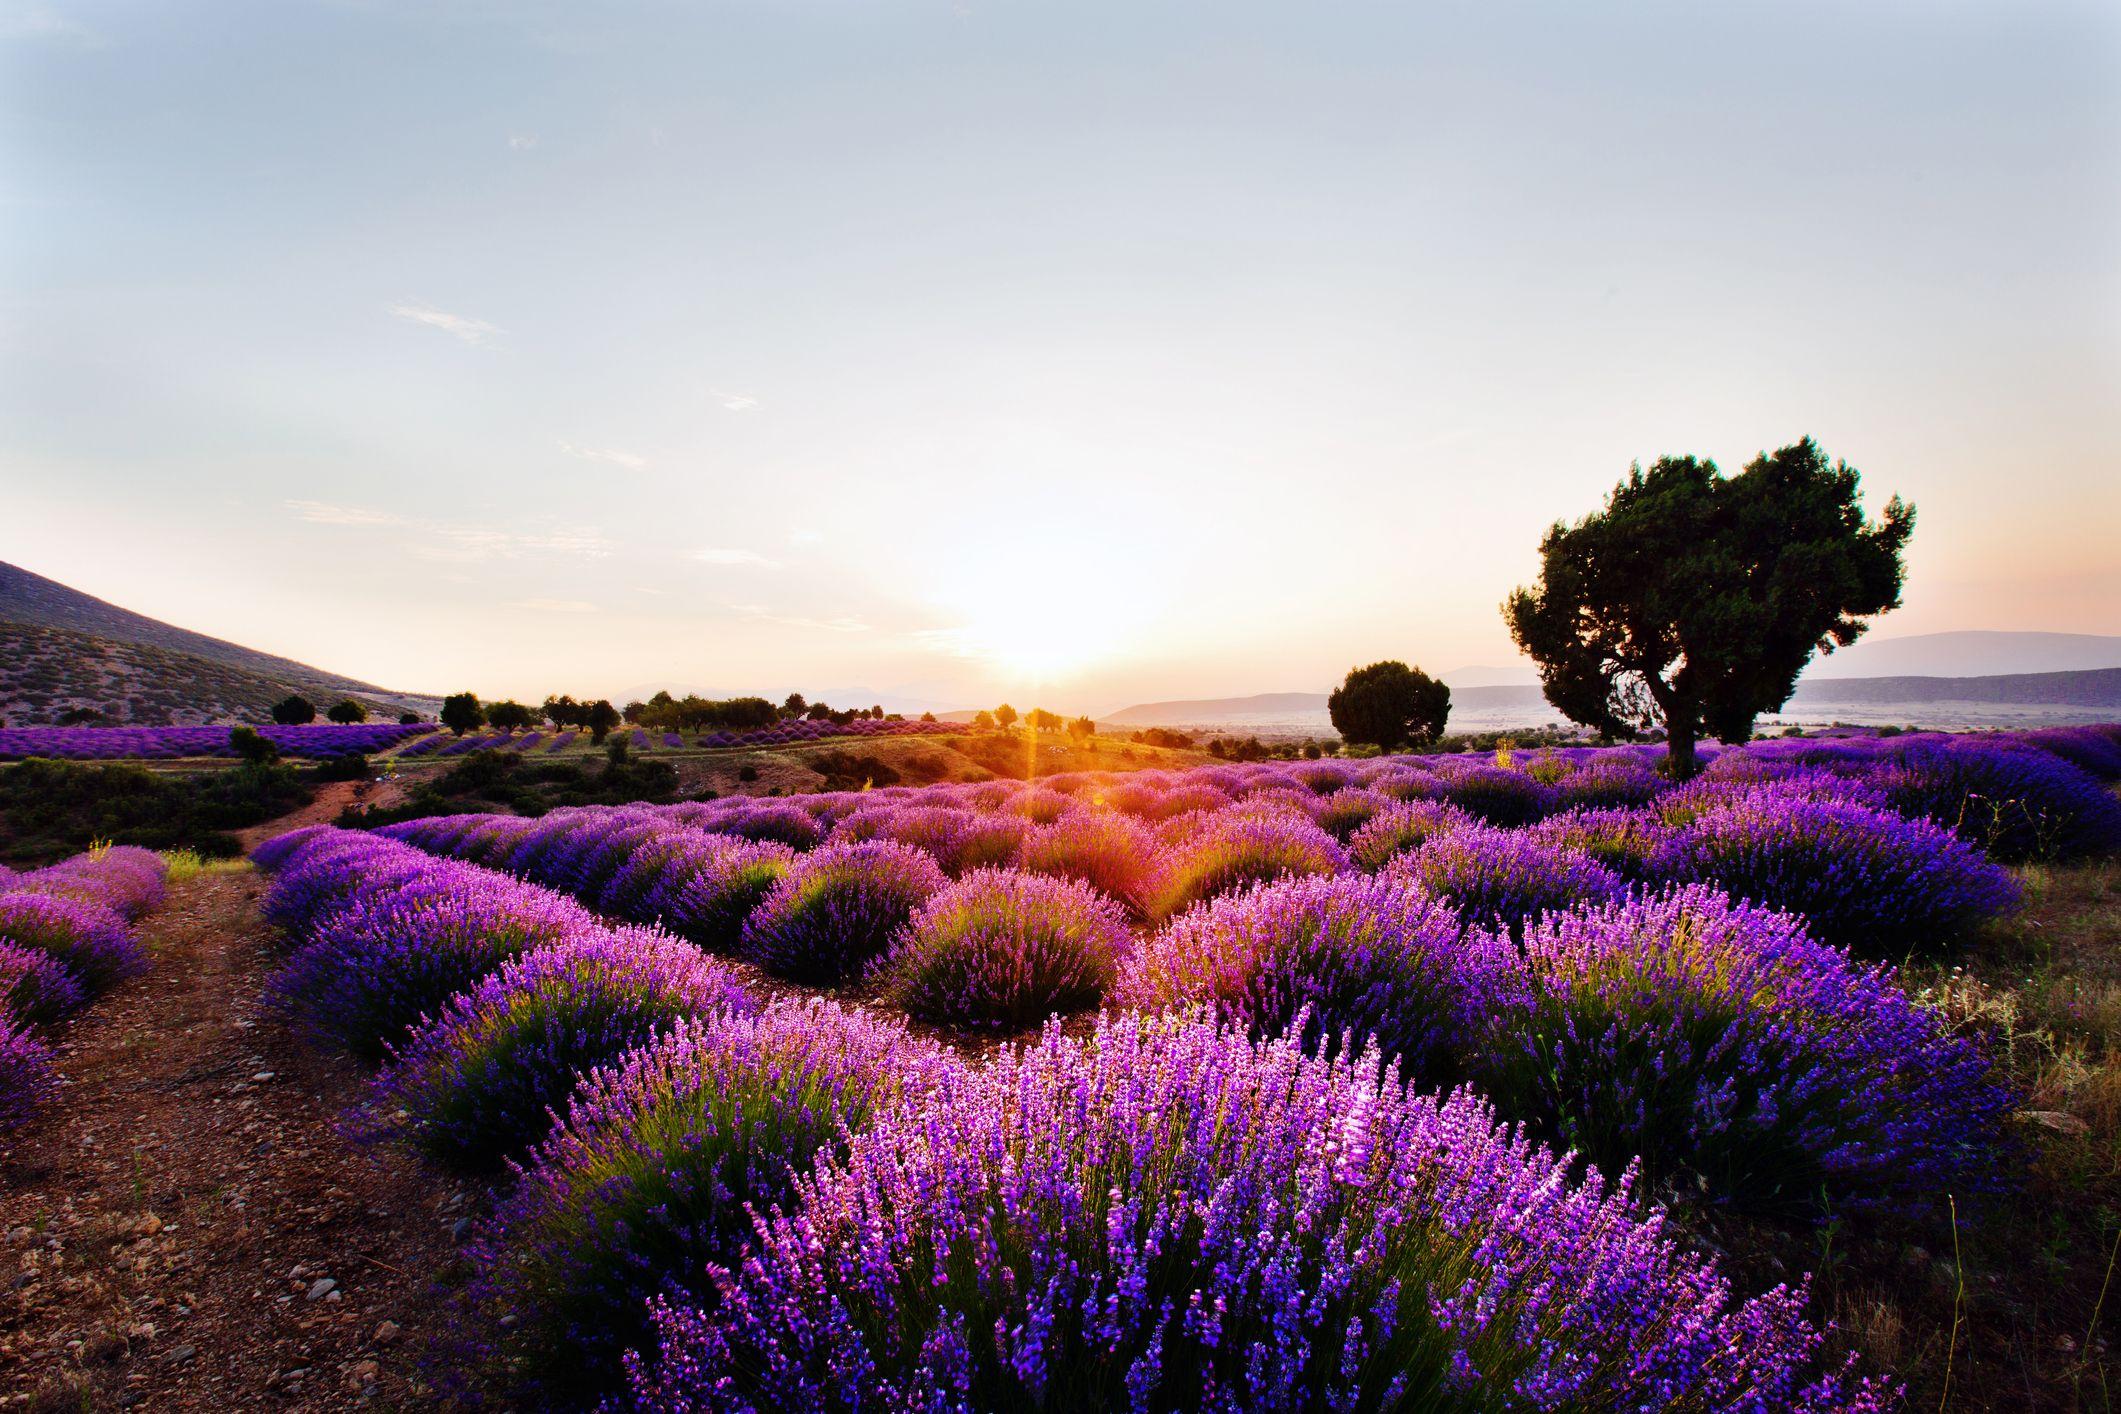 It's Peak Lavender Season in Turkey, so Book Your Vacation ASAP